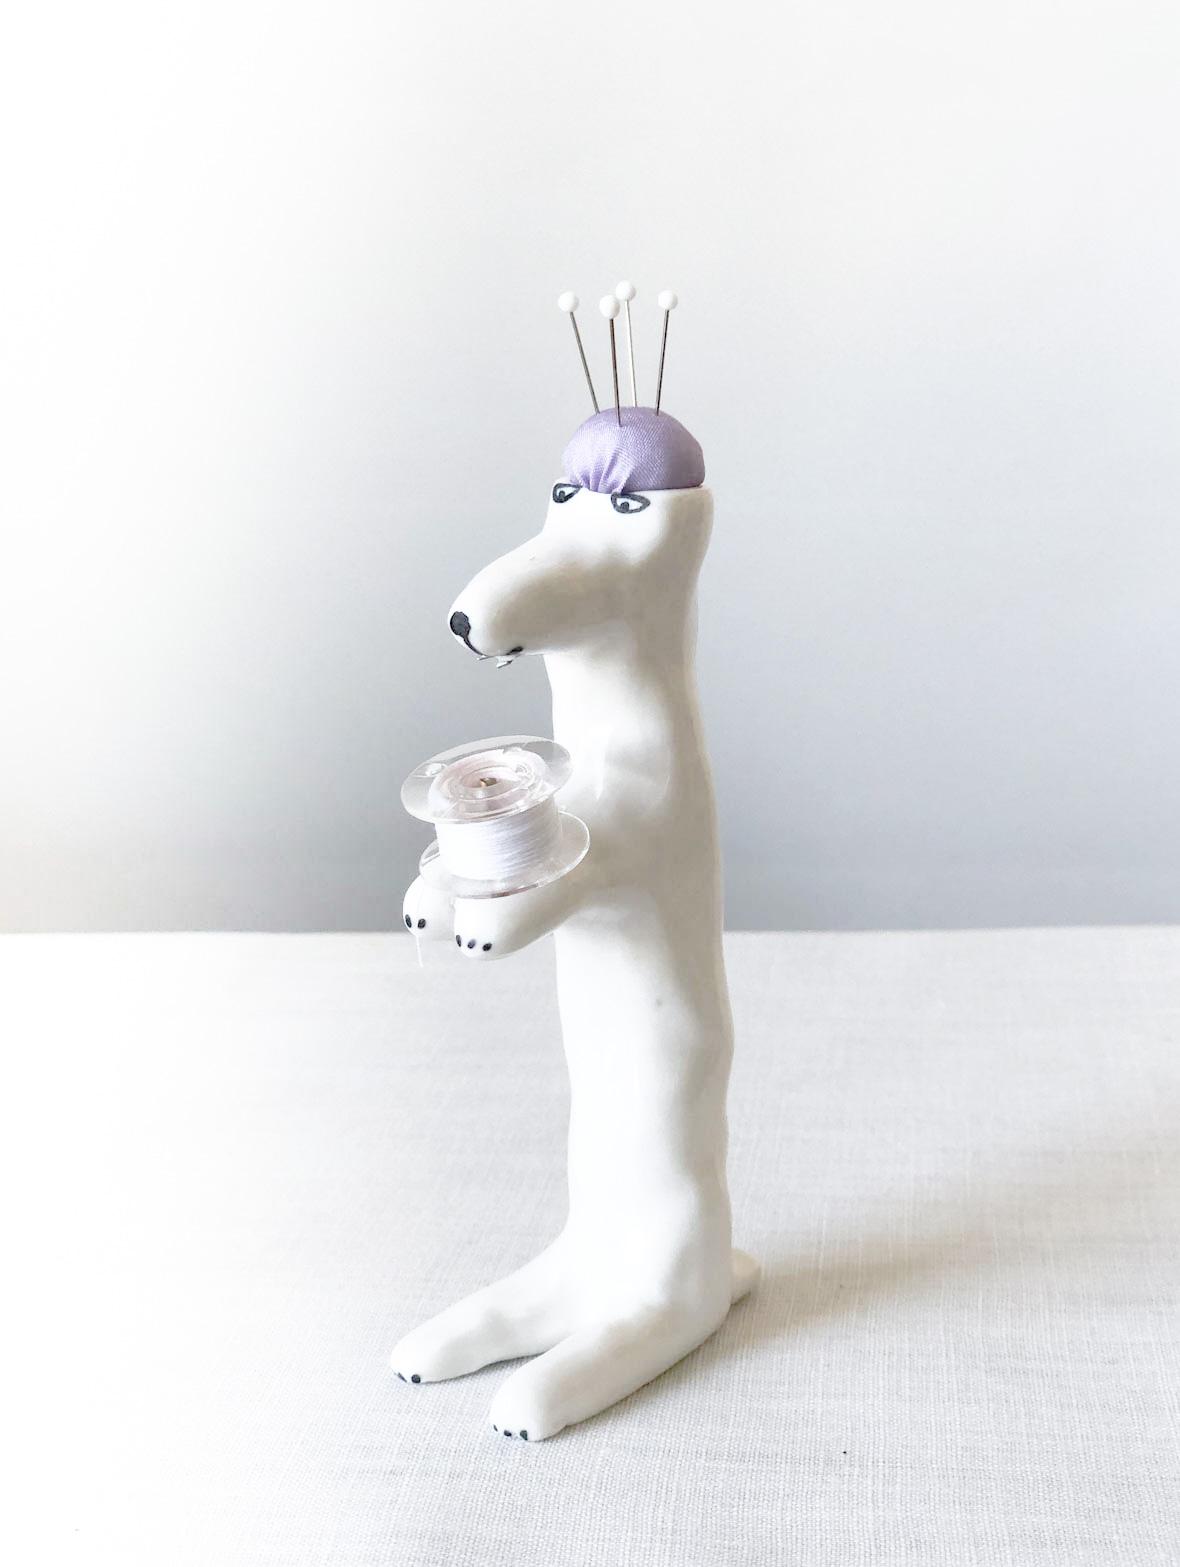 【TK】ピンクッション(おすわりしている犬・白-紫)